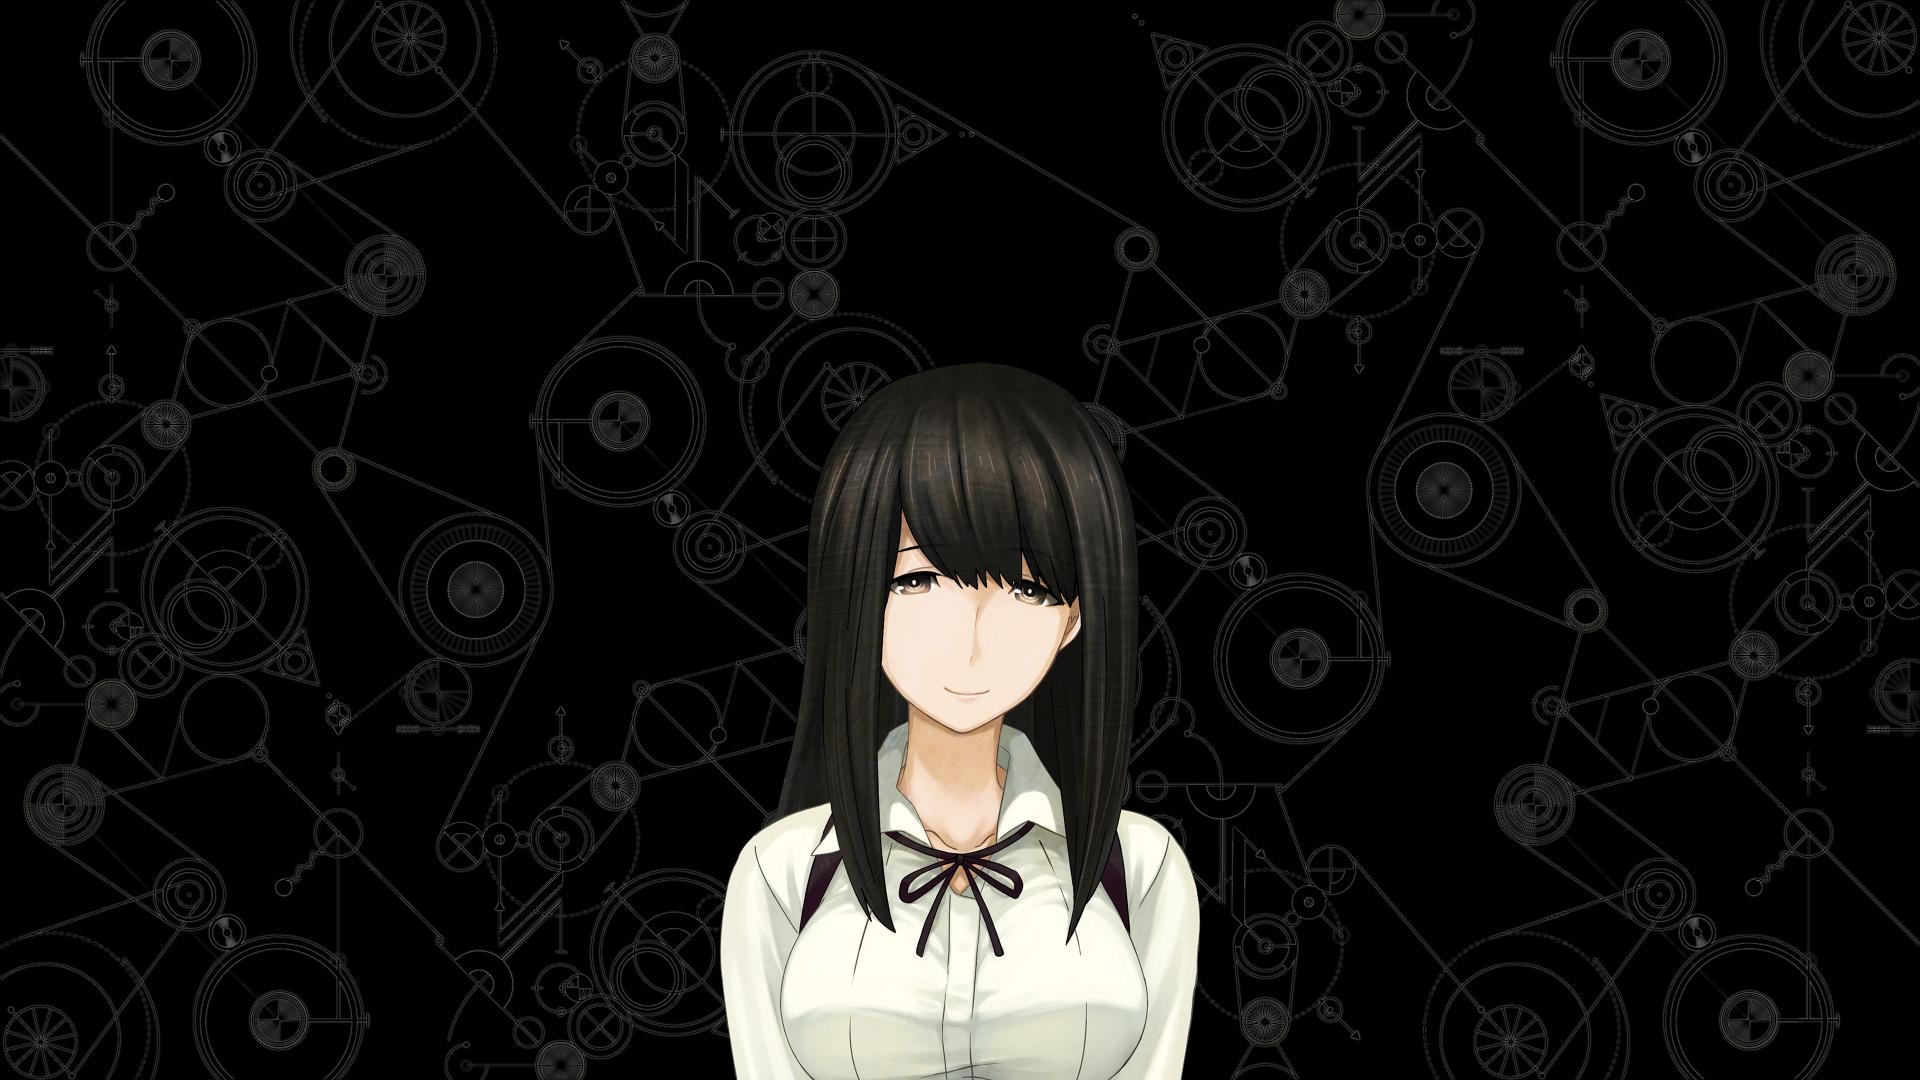 Wallpaper Kurushima kaede anime girl